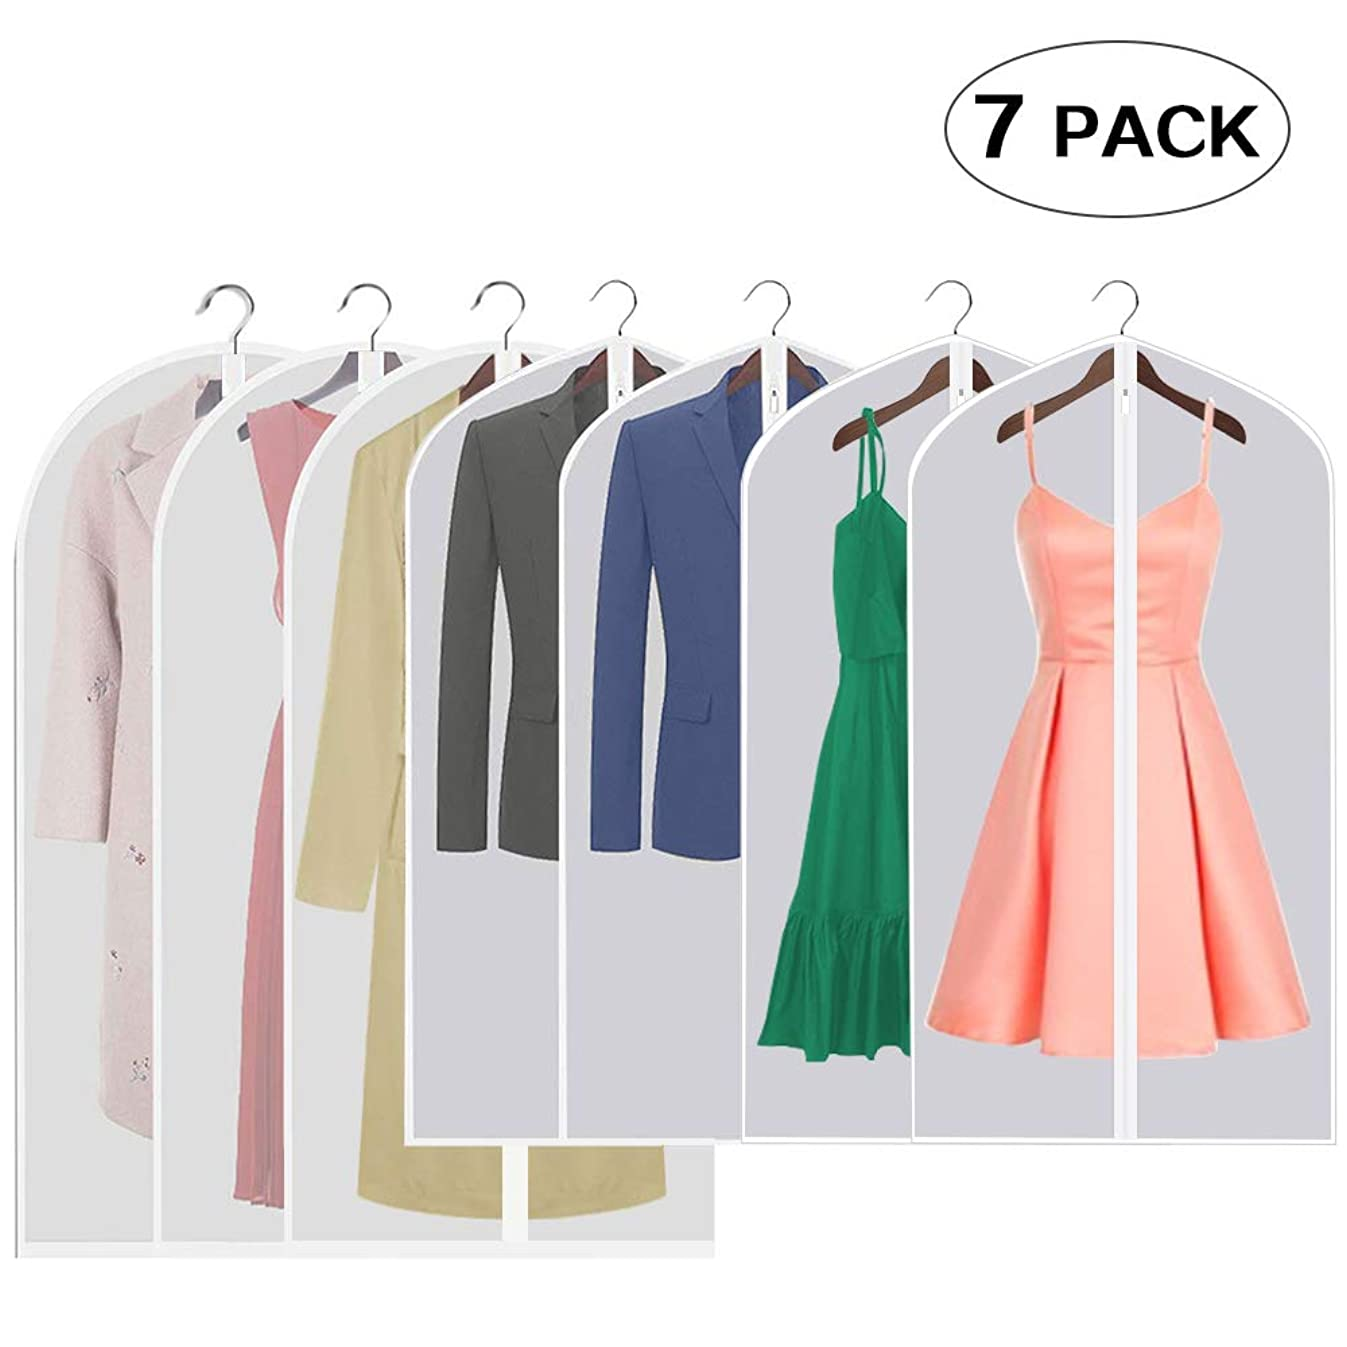 Aufisi Garment Cover Bag, Pack of 7 Premium Quality PEVA Moth Proof Clothes Covers Dustproof Clear Suit Garment Bag Breathable Full Zipper Dust Cover, 4 Pcs 40